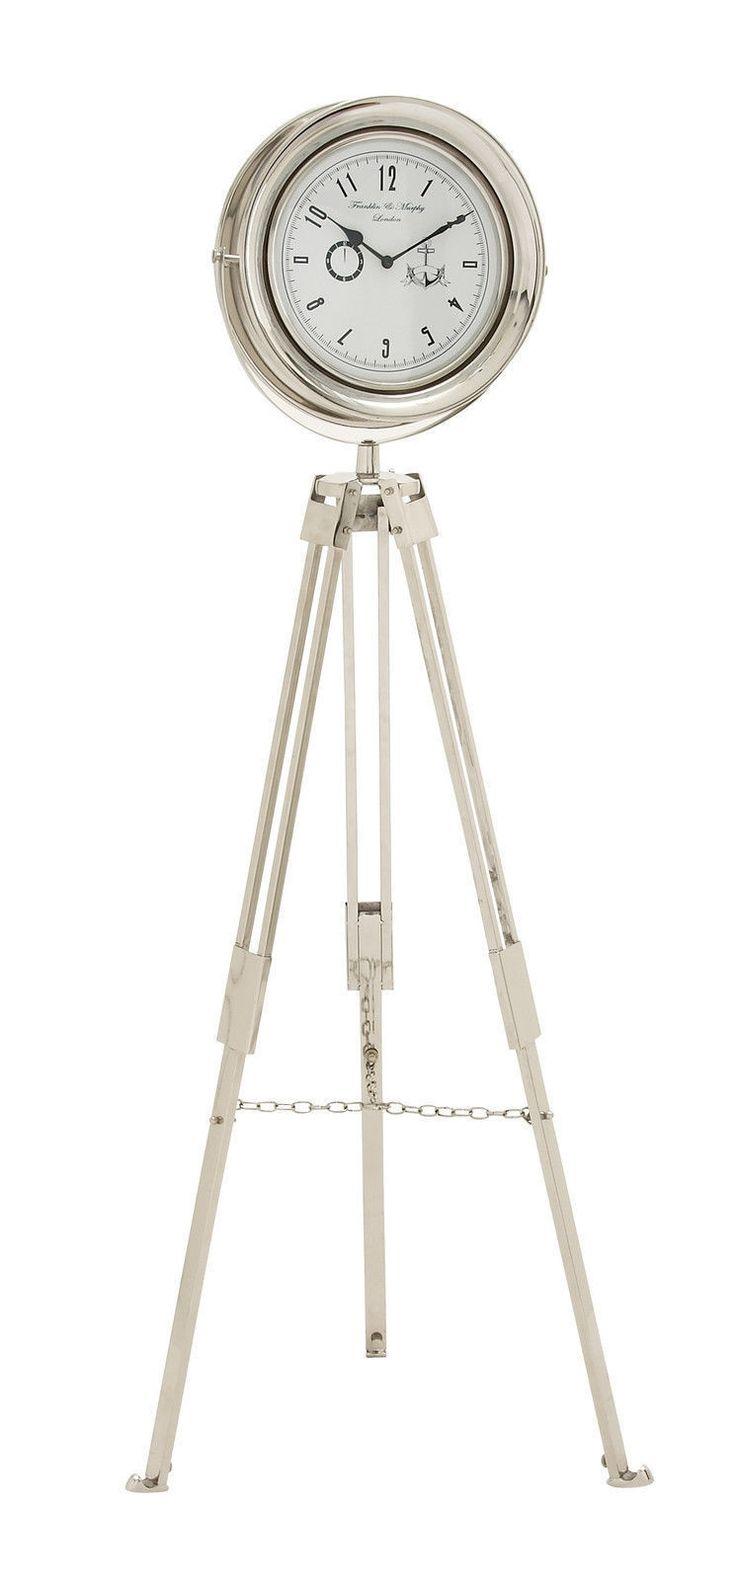 Silver Stainless Steel Tripod Standing Floor Clock Modern Home Decor